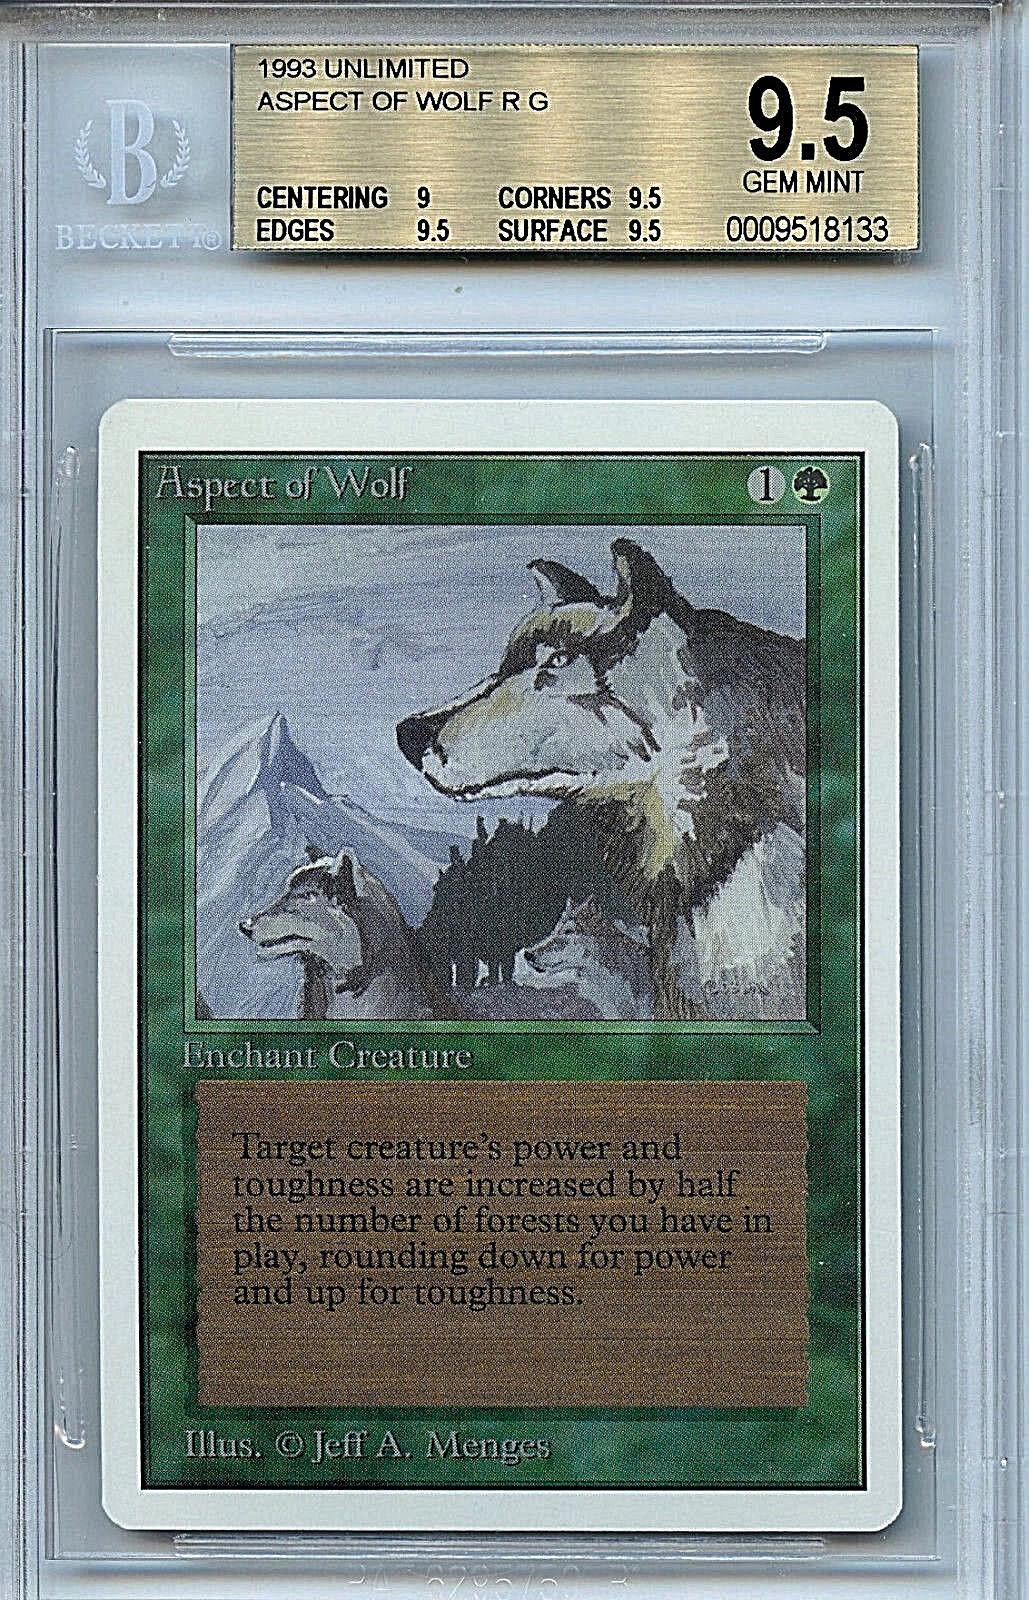 Mtg unbegrenzte aspekt wolf bgs 9,5 gem - magic the gathering wotc 8133